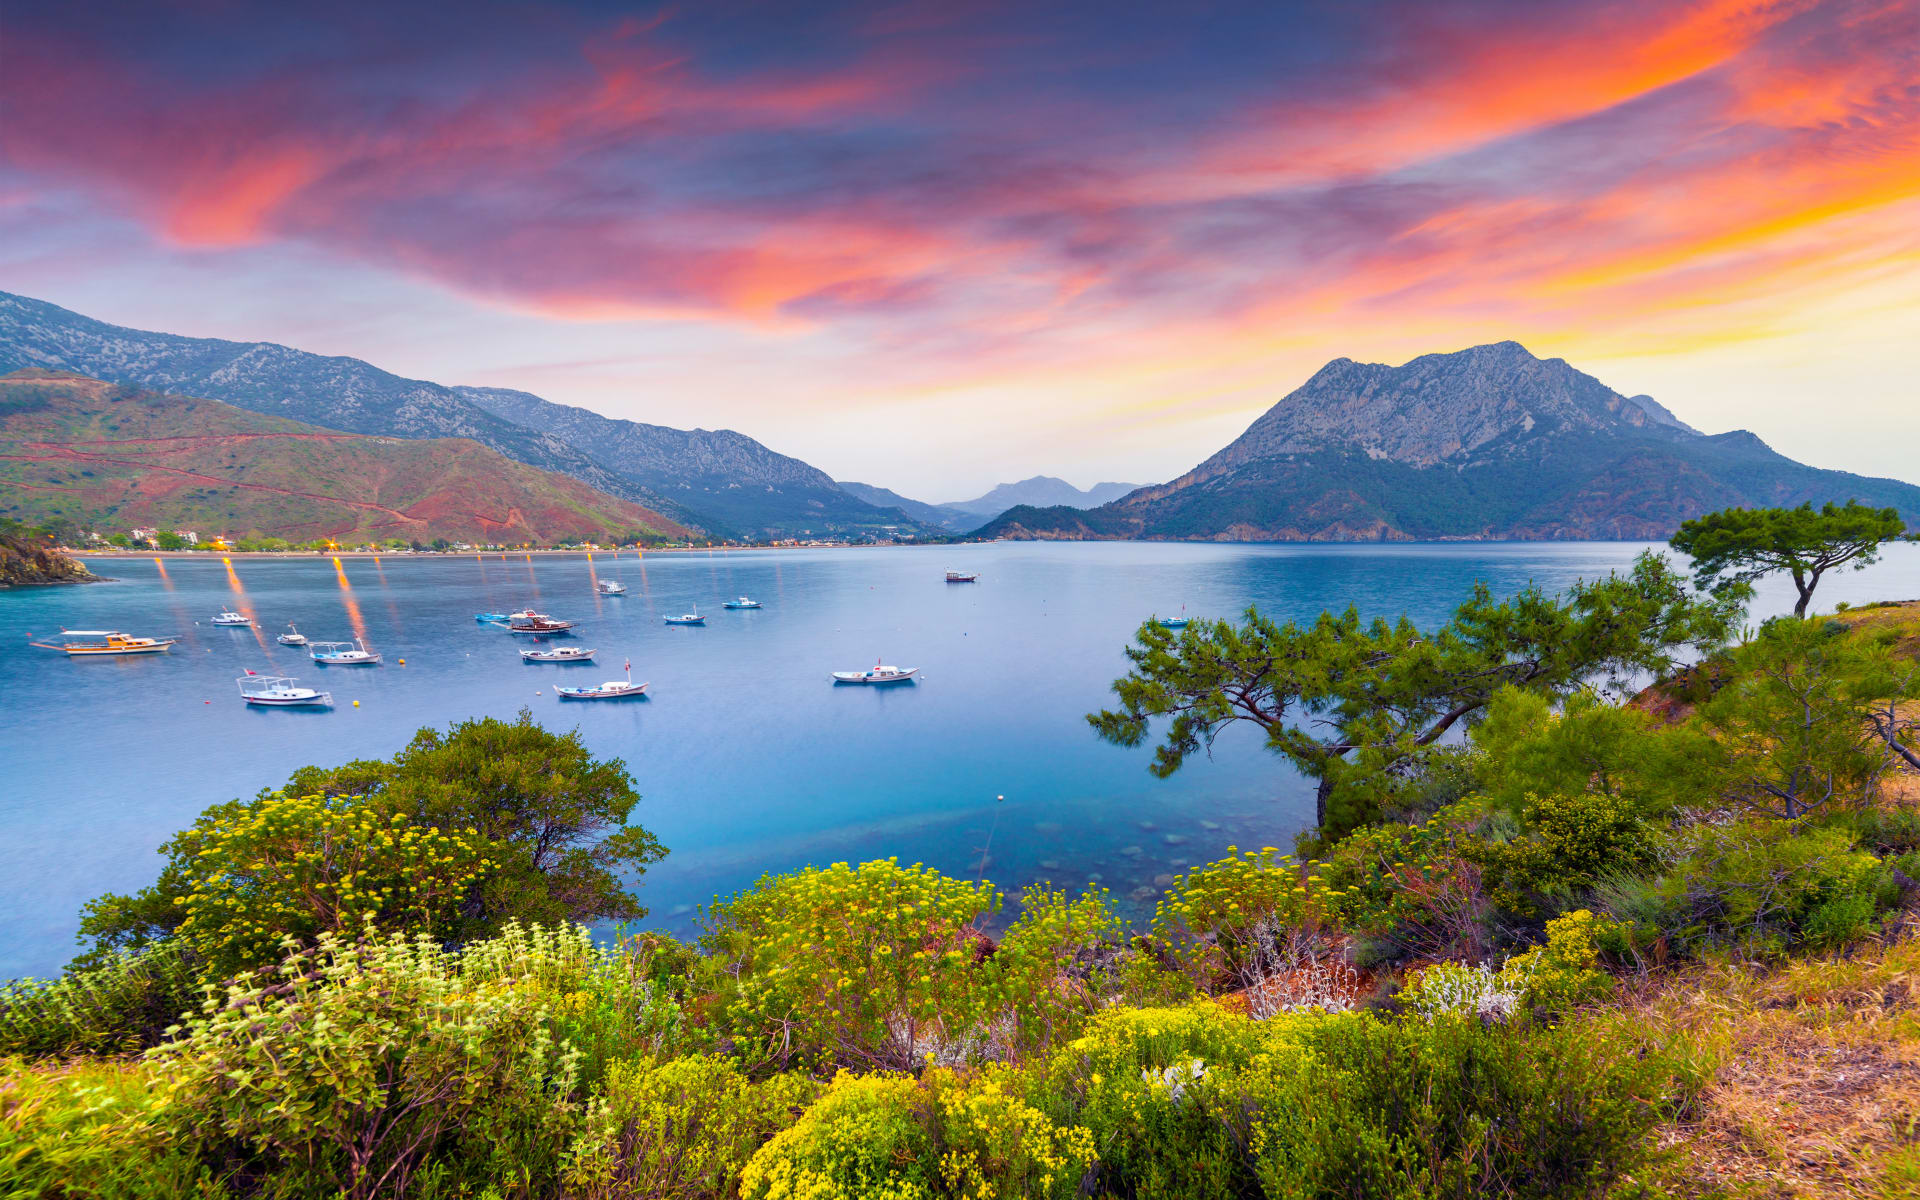 Badeferien im Delphine Deluxe Blue Waters ab Antalya: Sonnenuntergang_Türkei